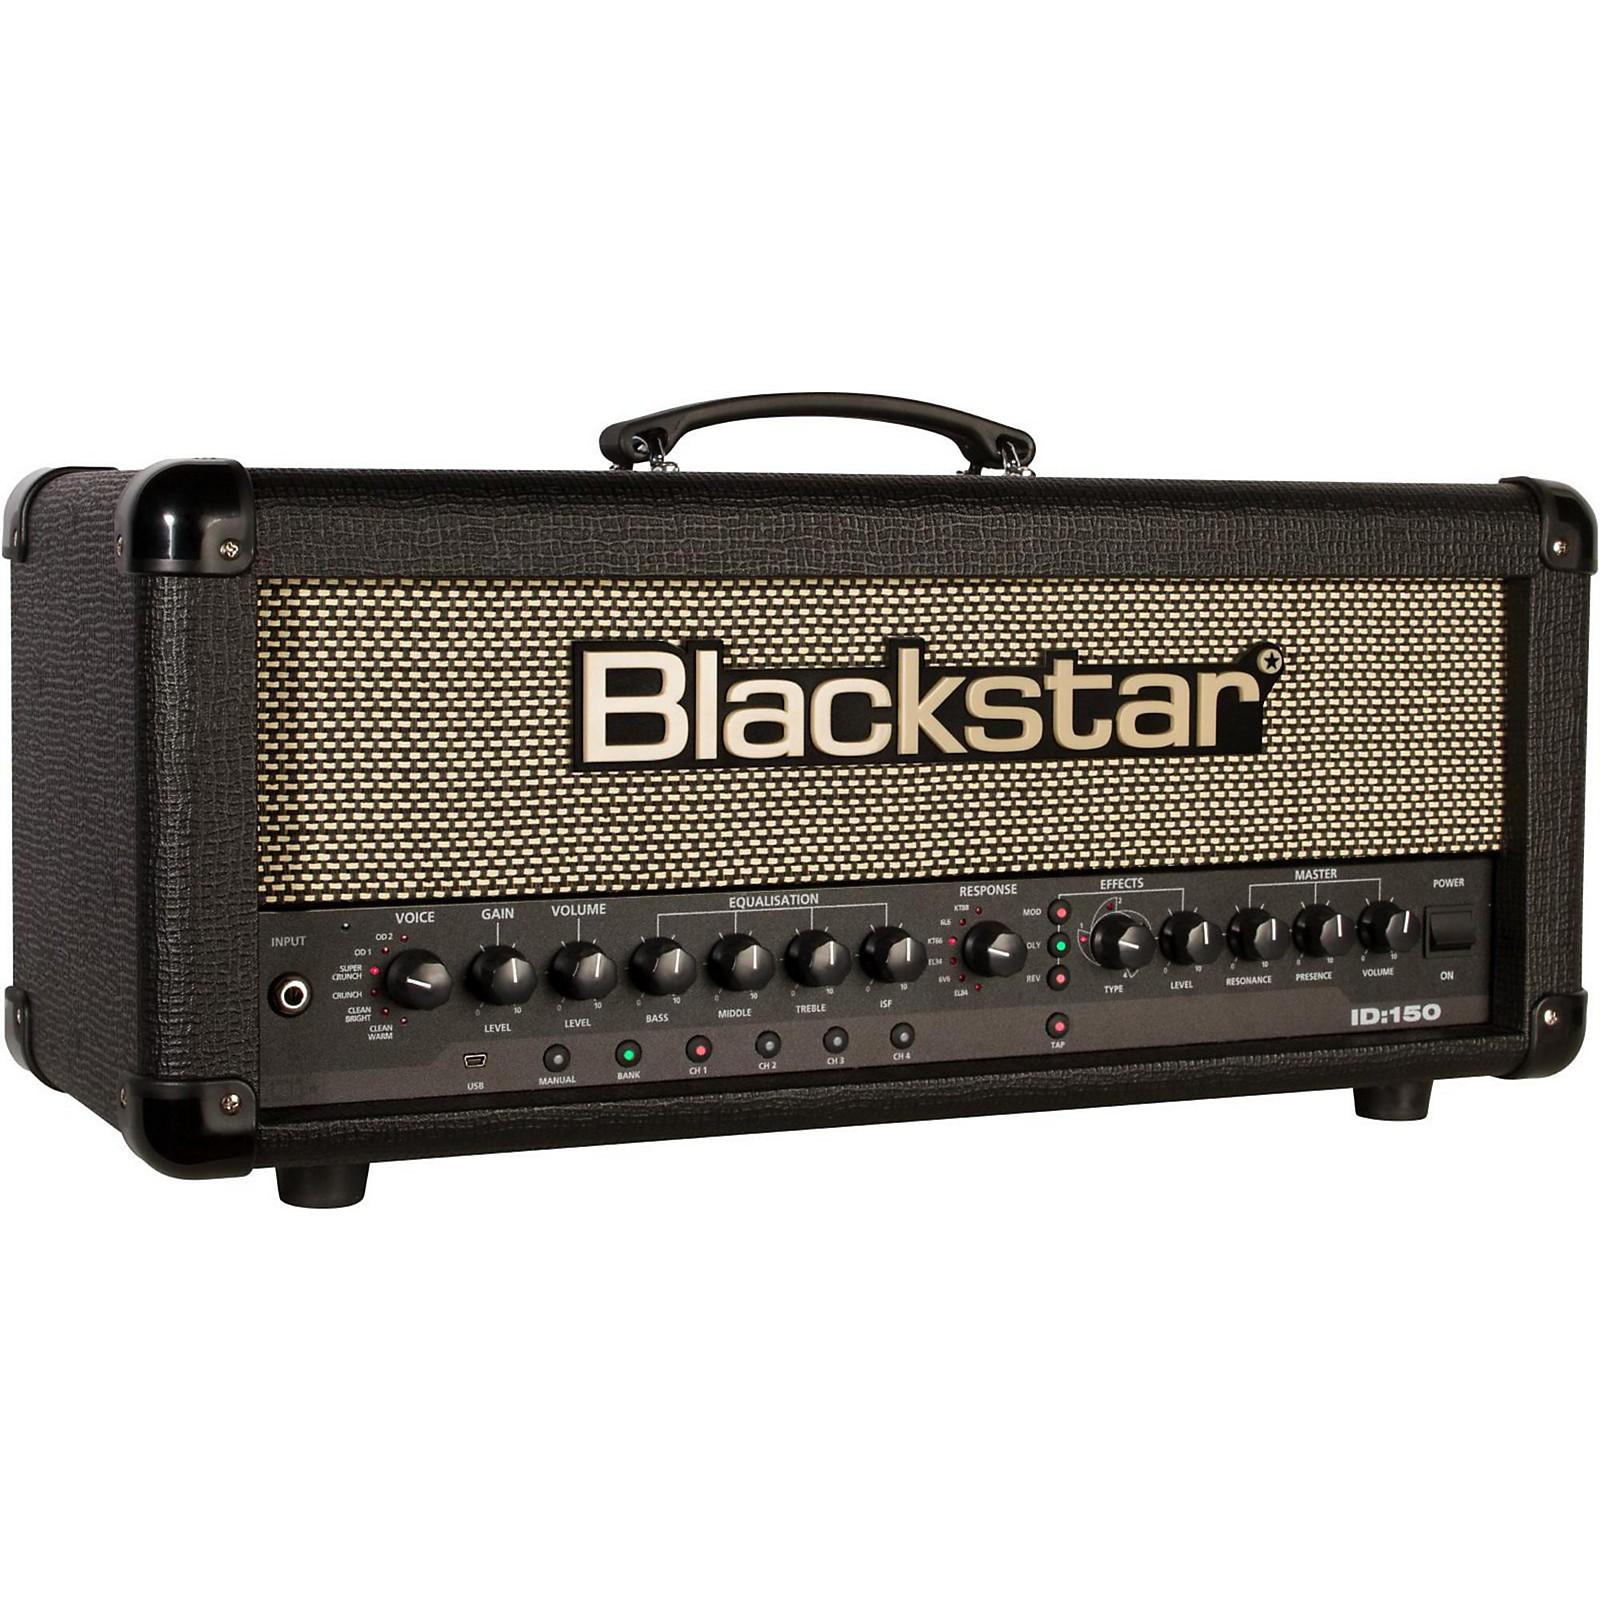 Open Box Blackstar ID150H 150W Digital Guitar Amplifier Head